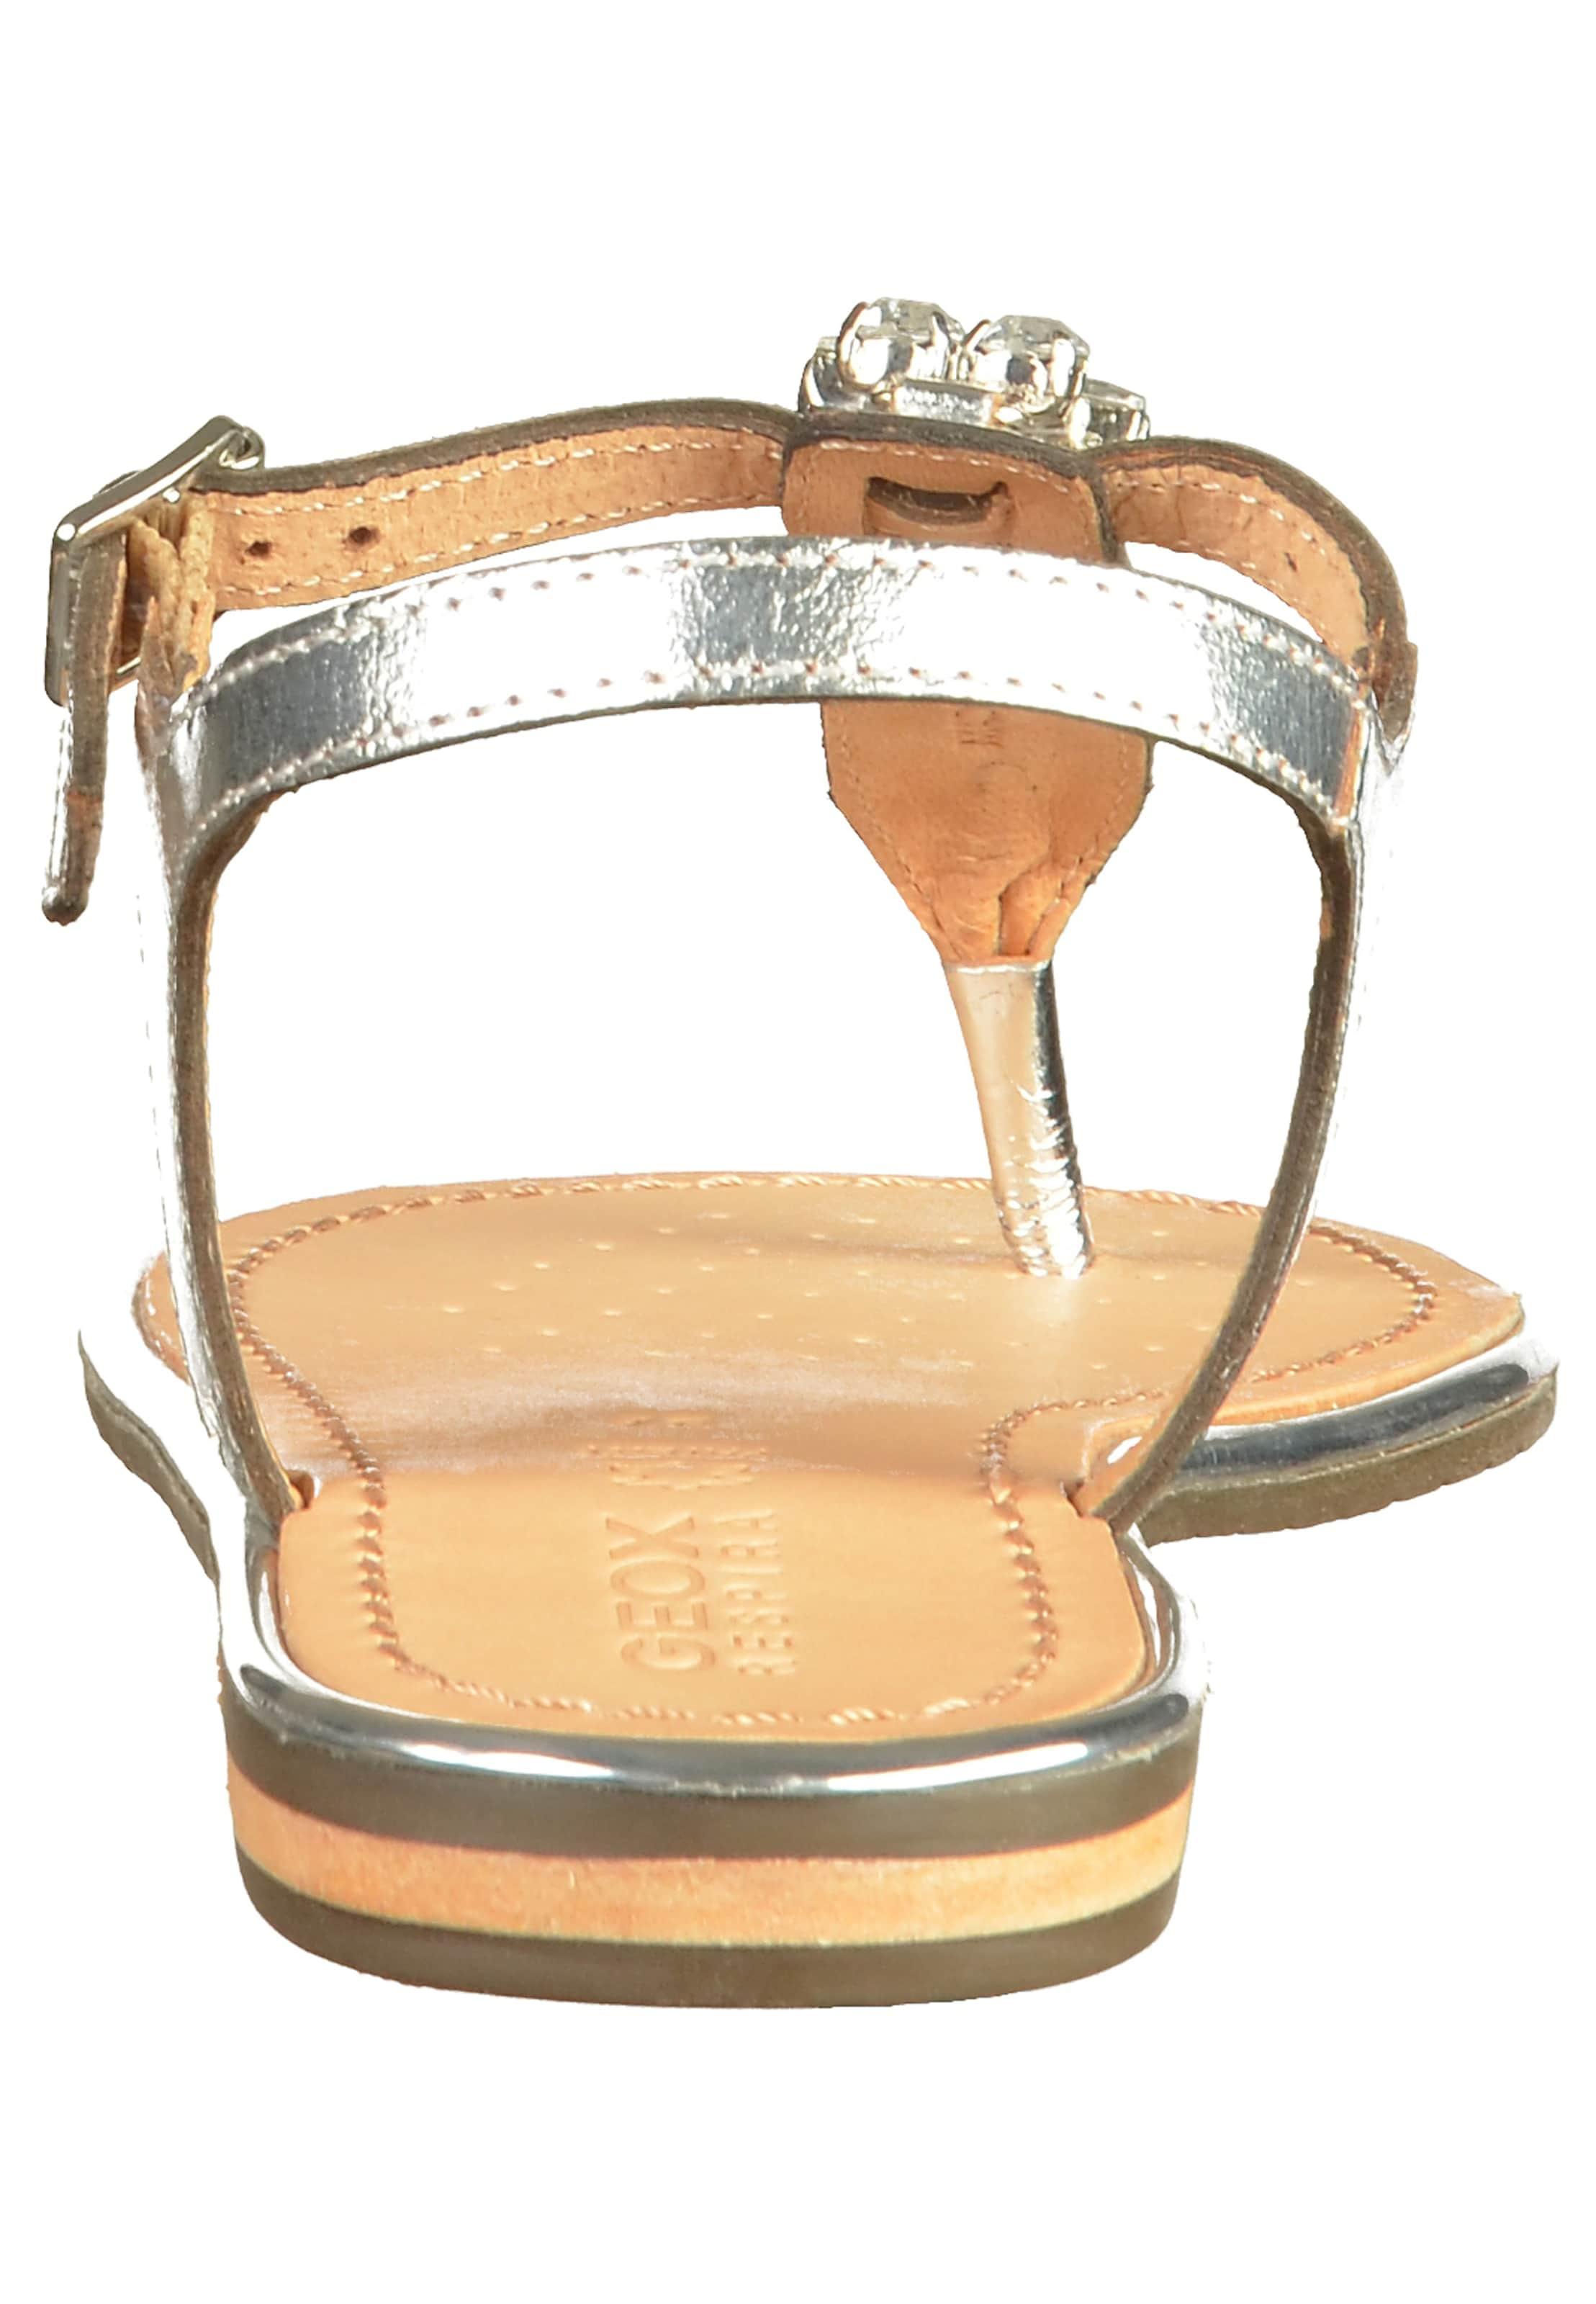 Silber Sandalen Sandalen Geox In Geox n0wyONm8v